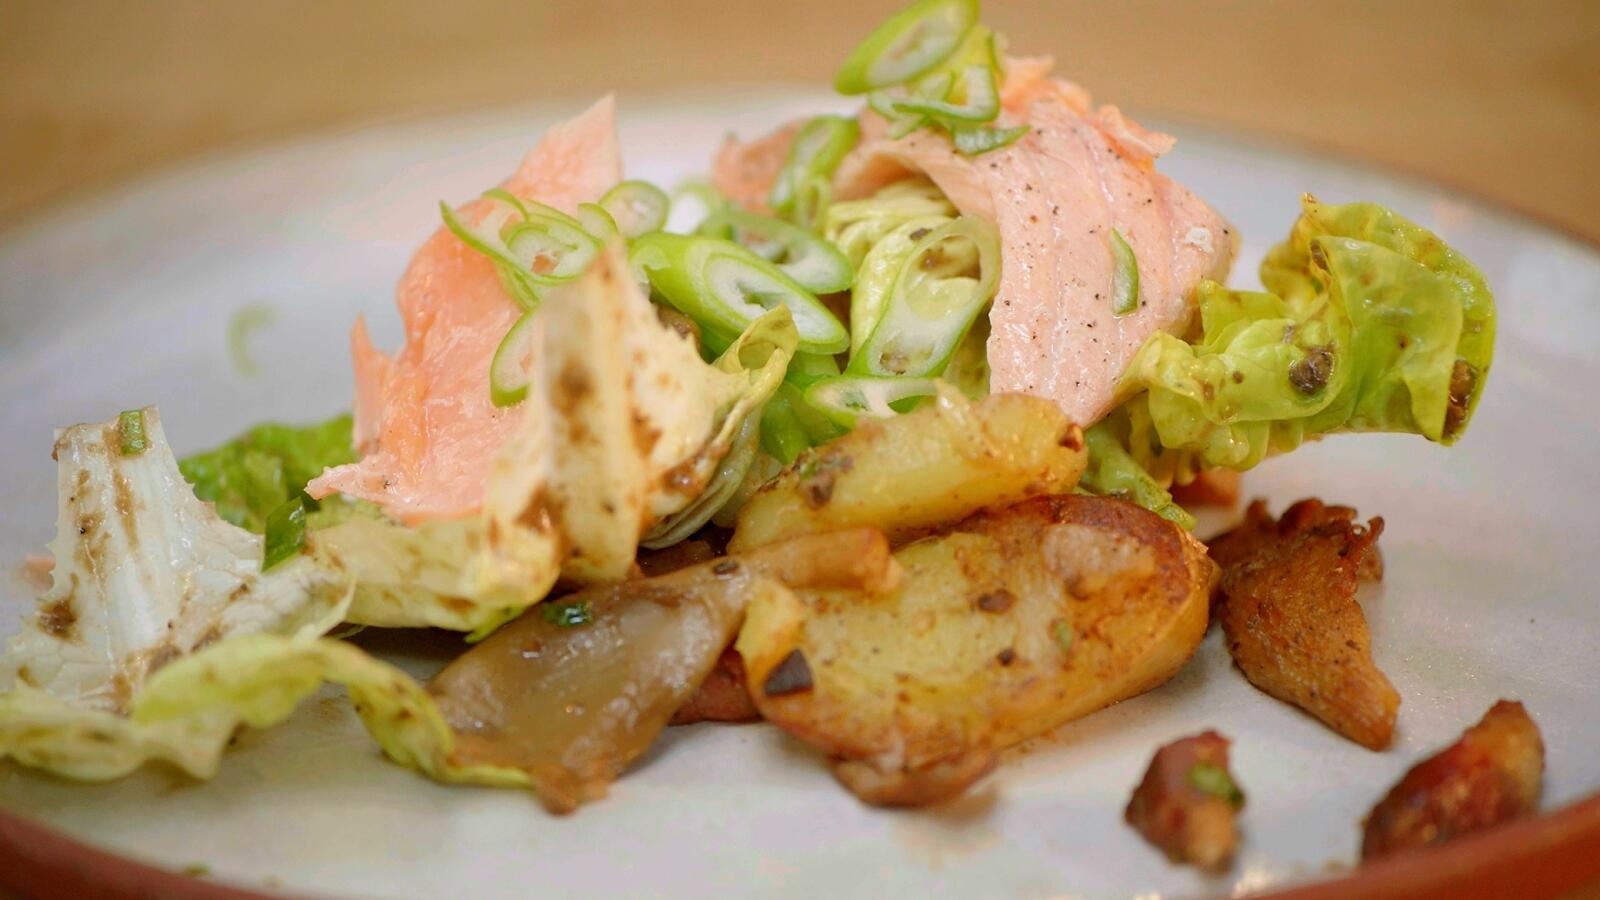 Lauwe salade met zalm